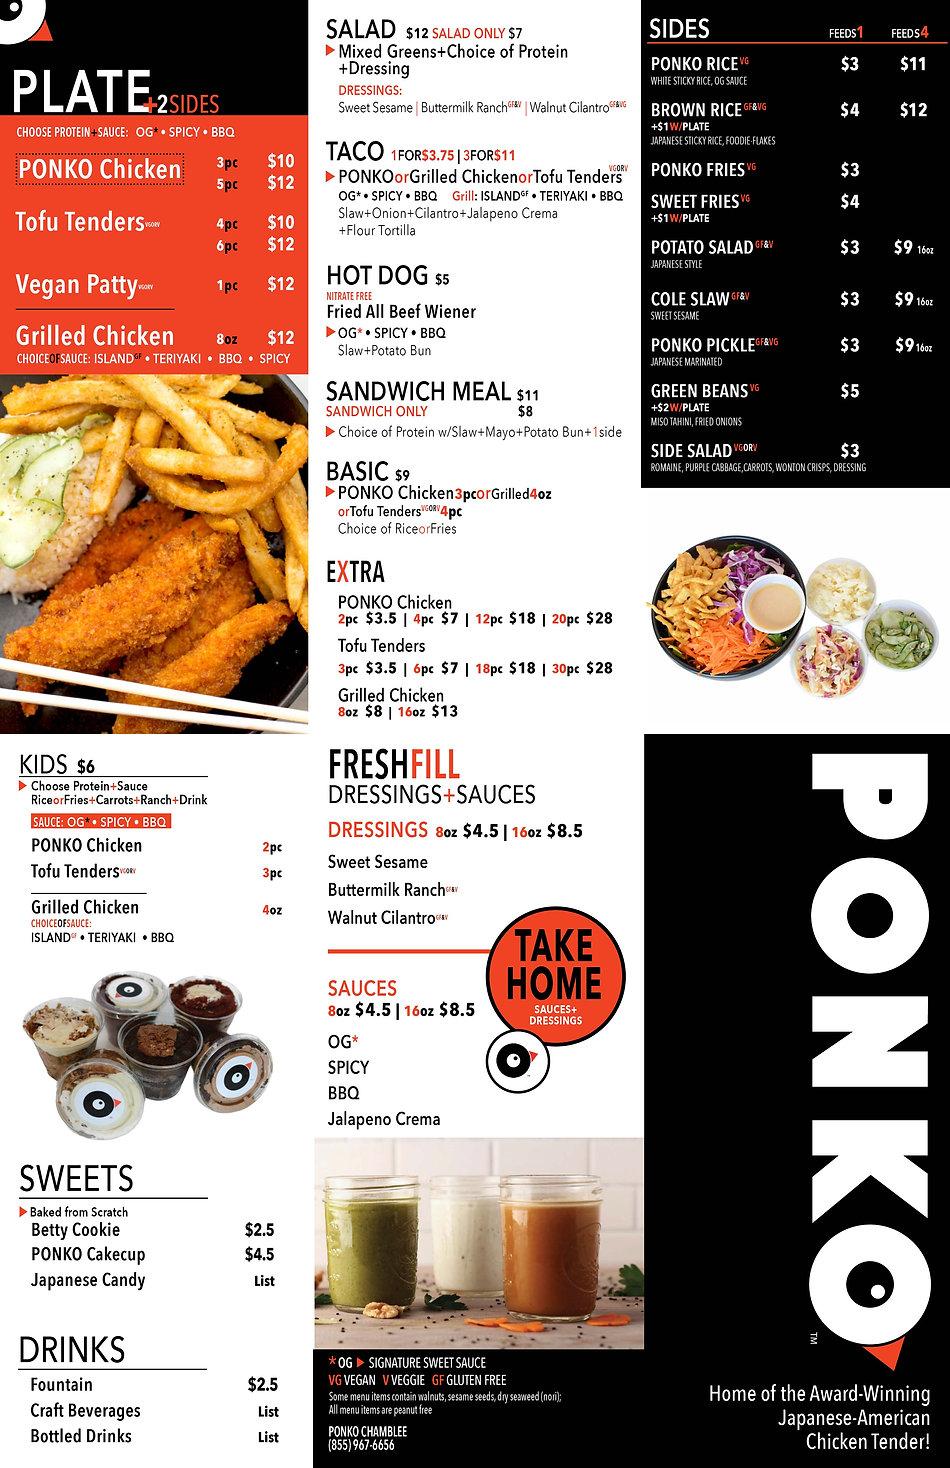 ponko chamblee To Go 11x8.5V2 21.0701FINAL Website copy.jpg